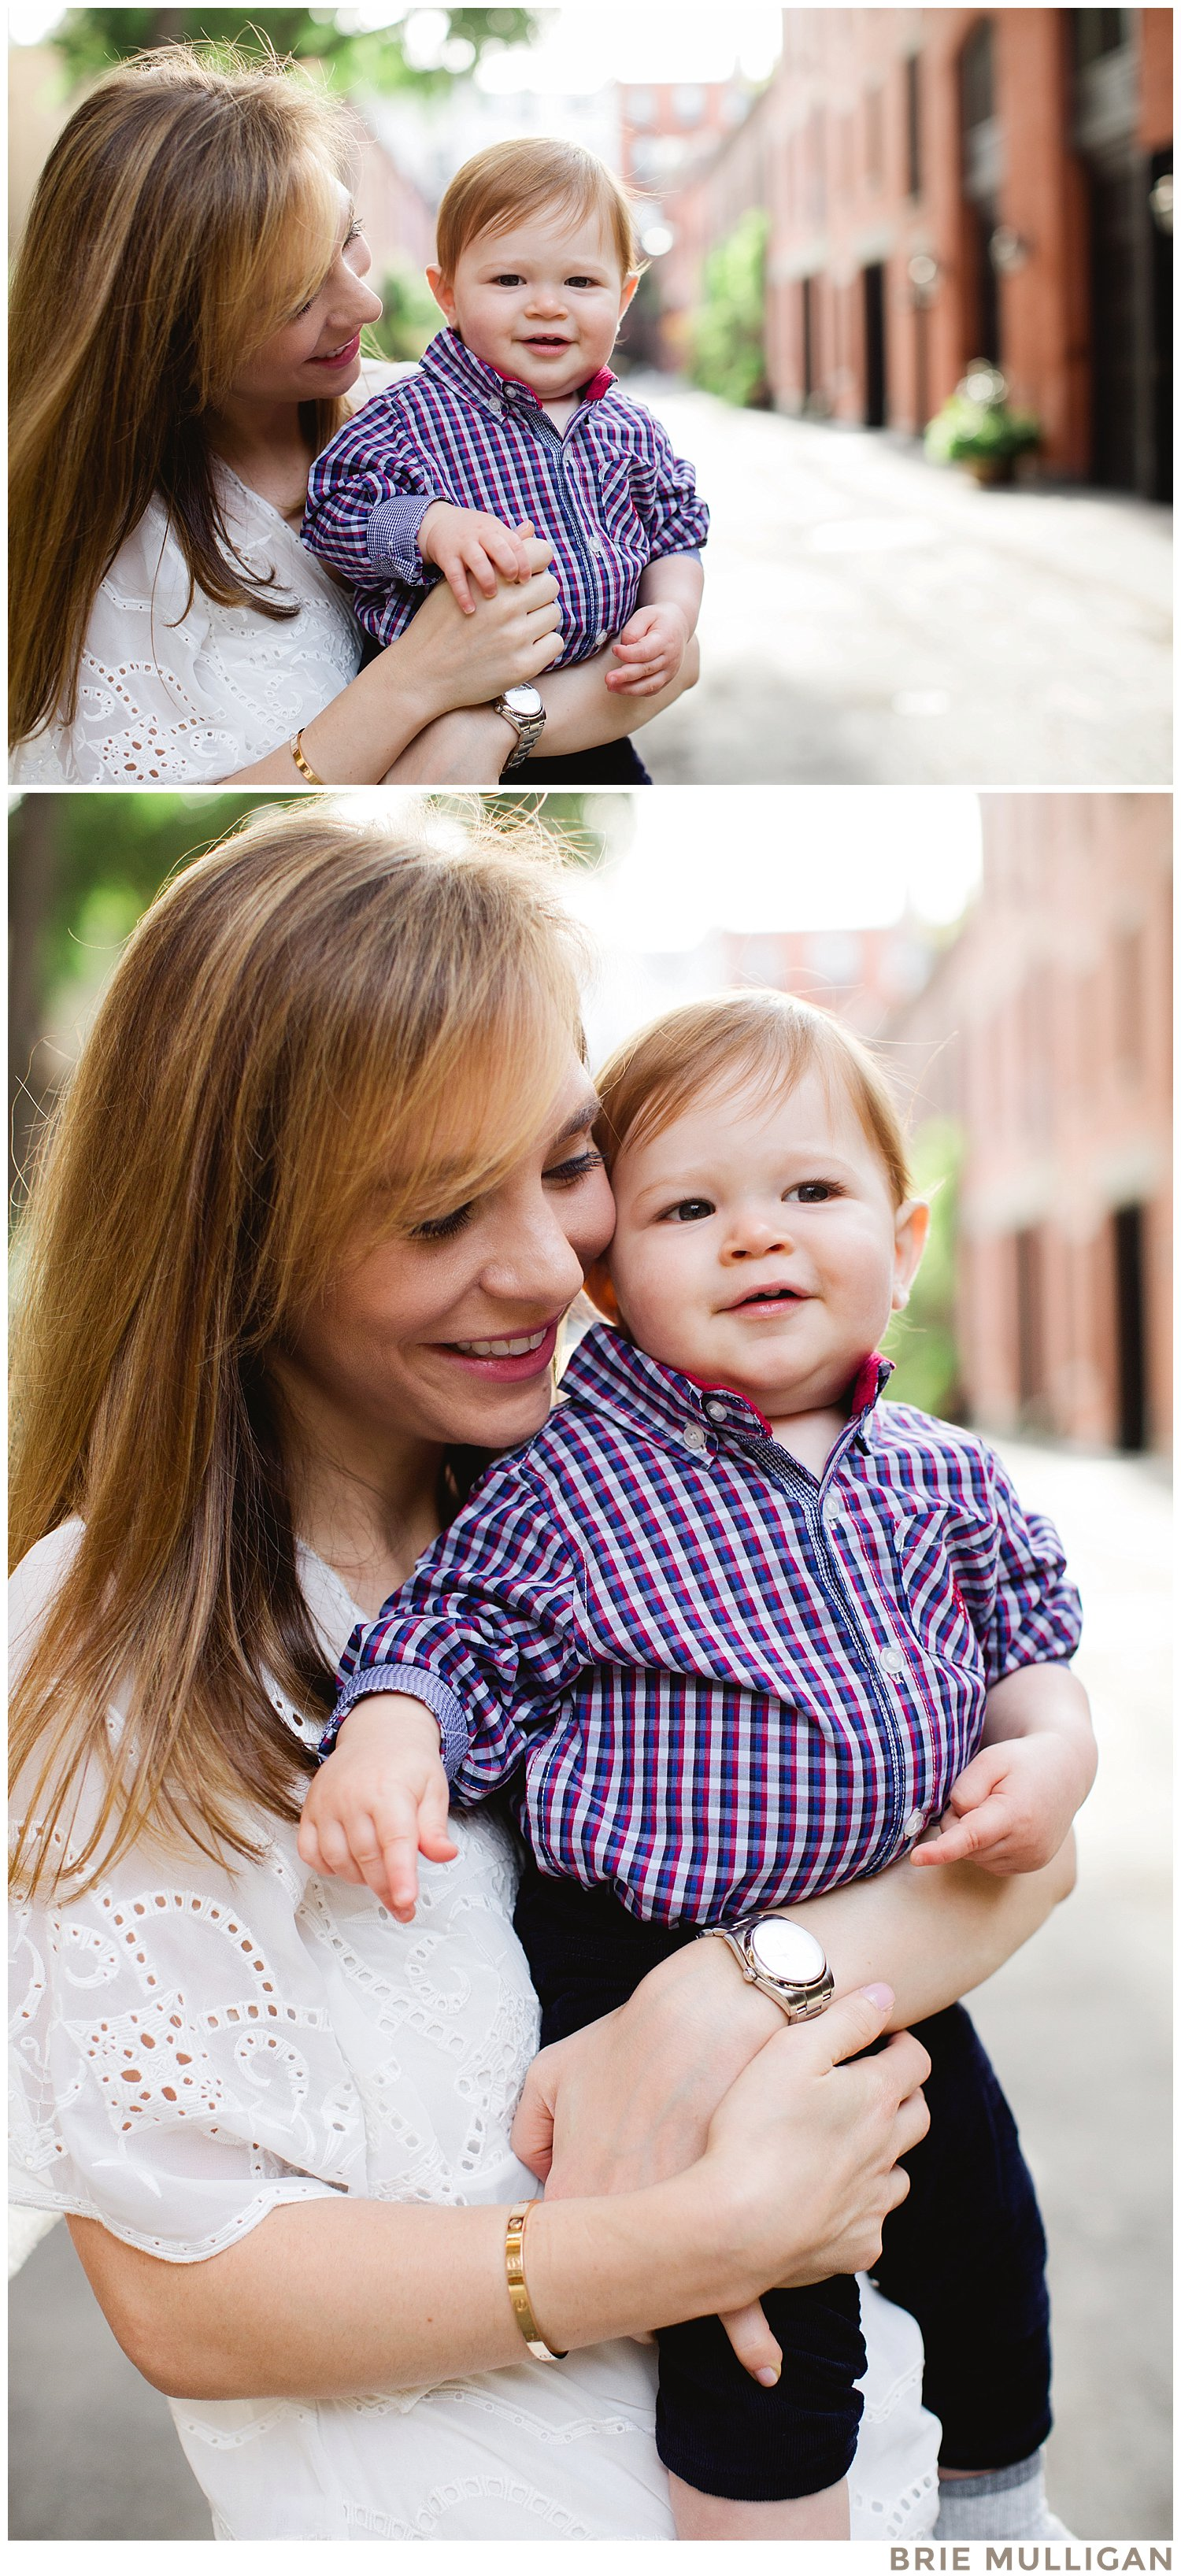 Brie-Mulligan-Family-and-Newborn-Photographer-NYC-and-Northern-NJ_0124.jpg